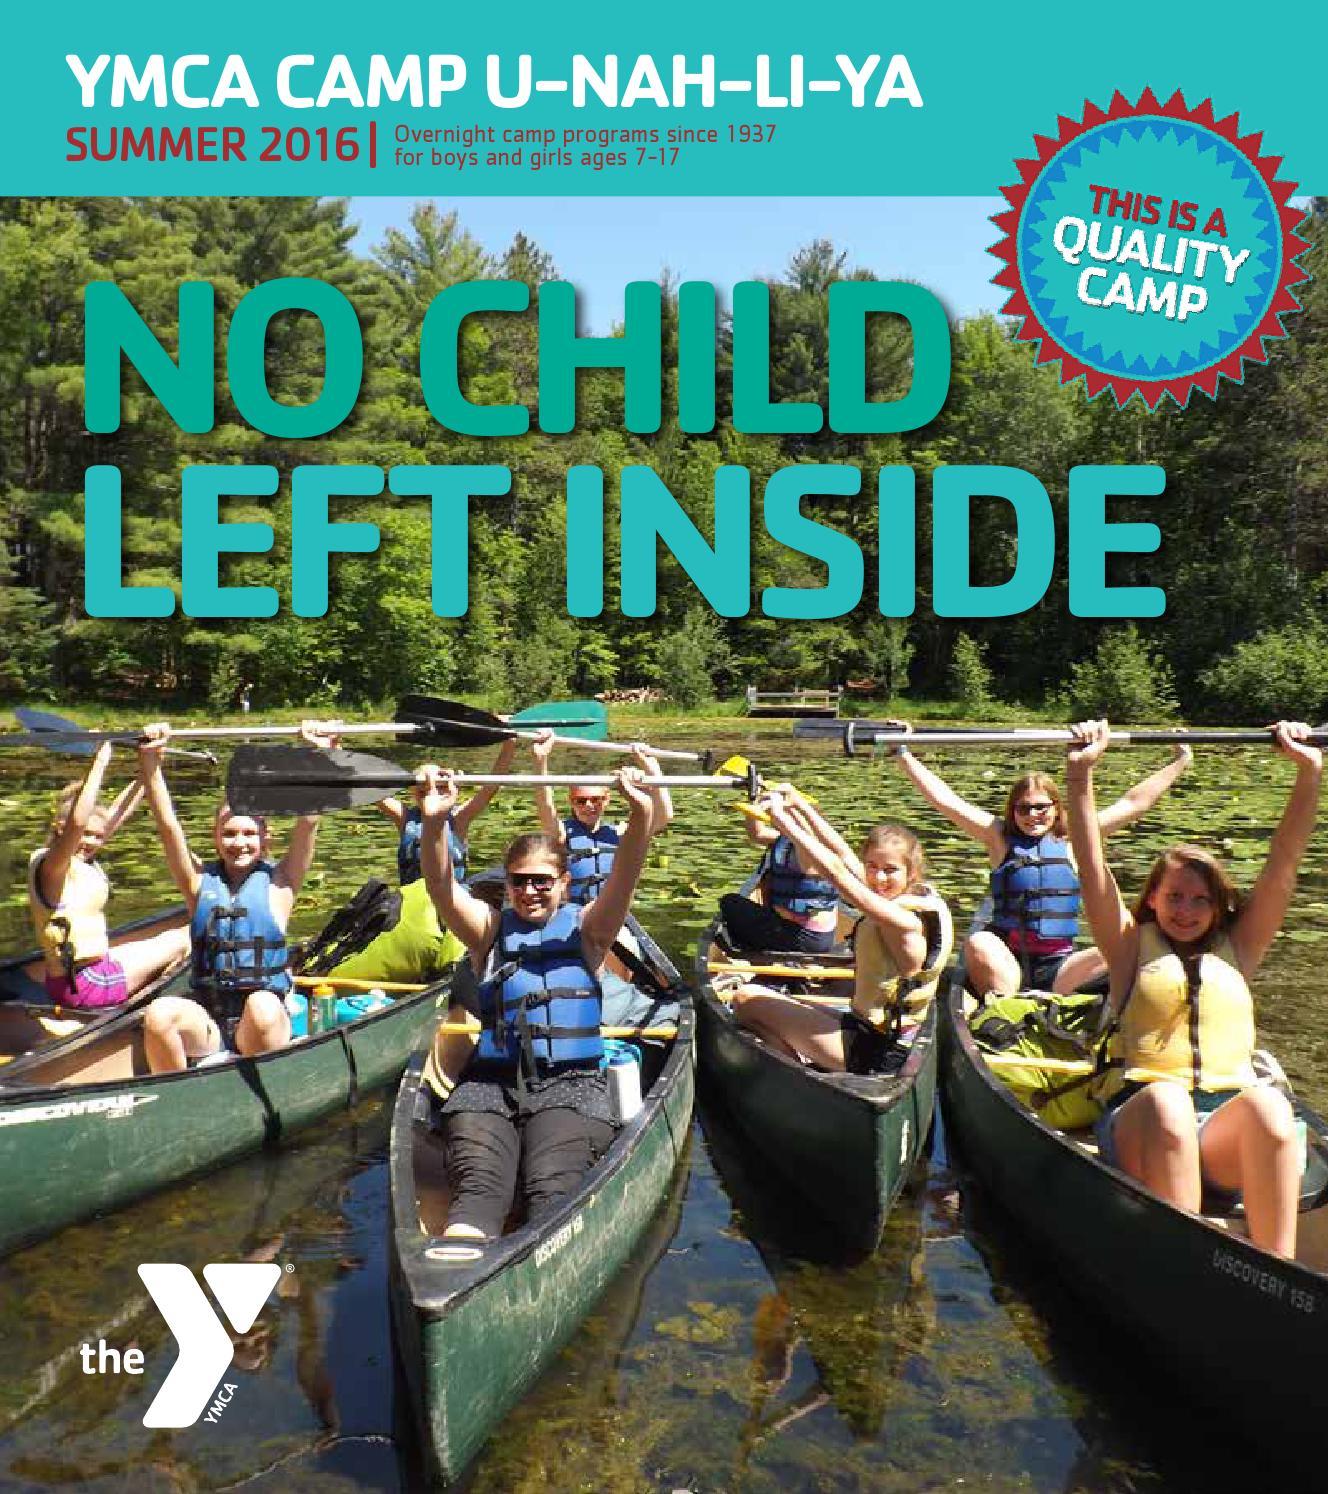 Ymca Youth Camps: YMCA Camp U-Nah-Li-Ya Summer 2016 By Teresa Kennedy